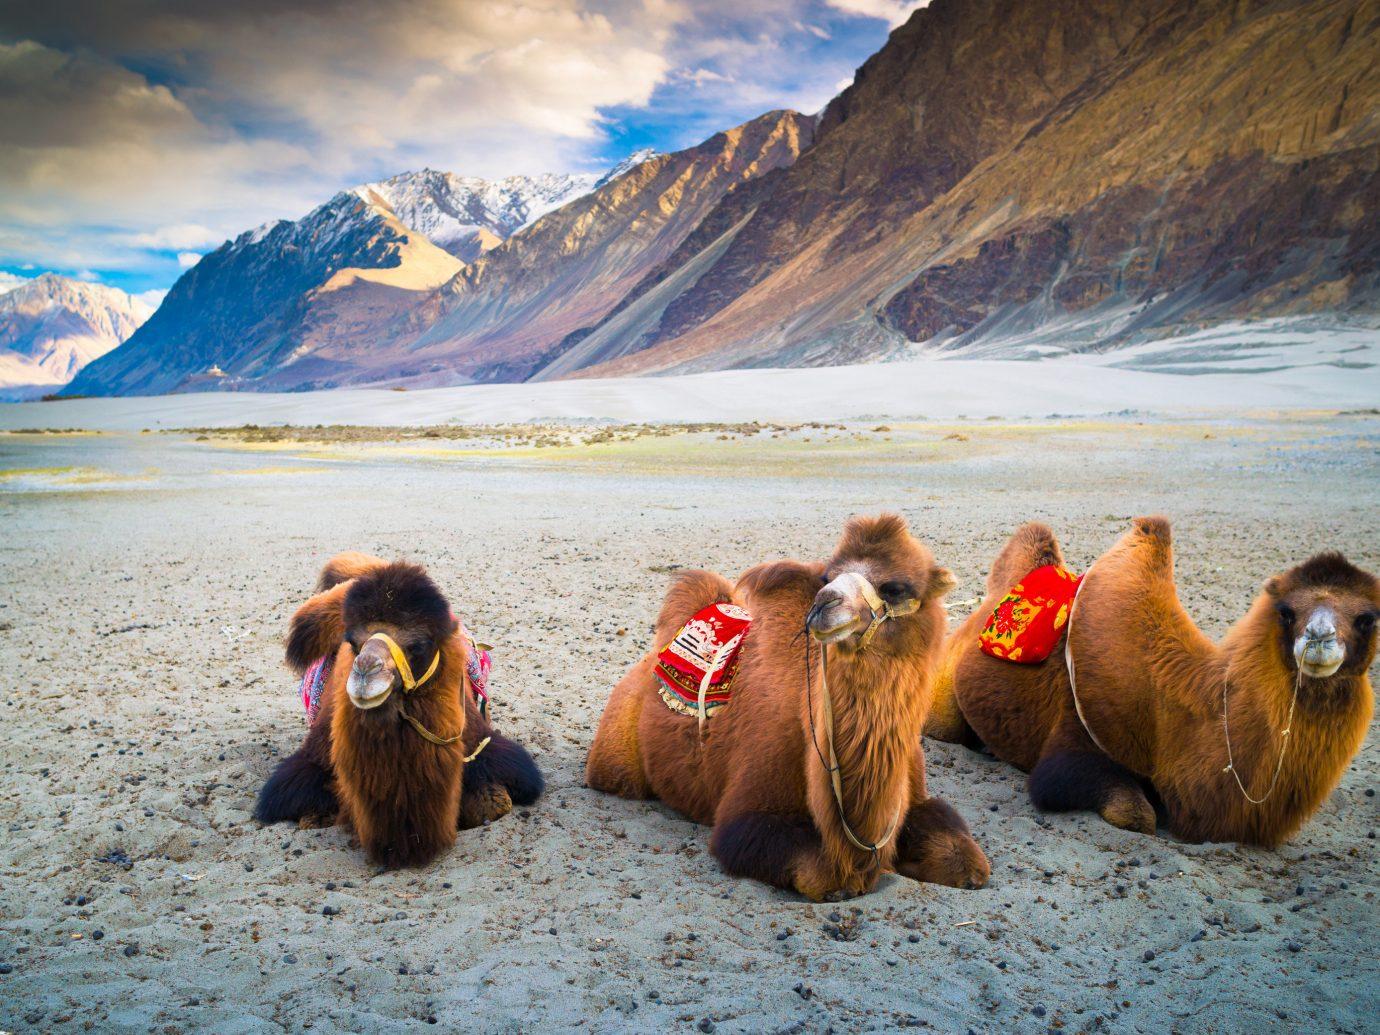 India Jaipur Jodhpur Trip Ideas mountain outdoor ground wilderness mammal mountainous landforms animal sky arctic ecoregion Camel camel like mammal landscape tundra llama highland